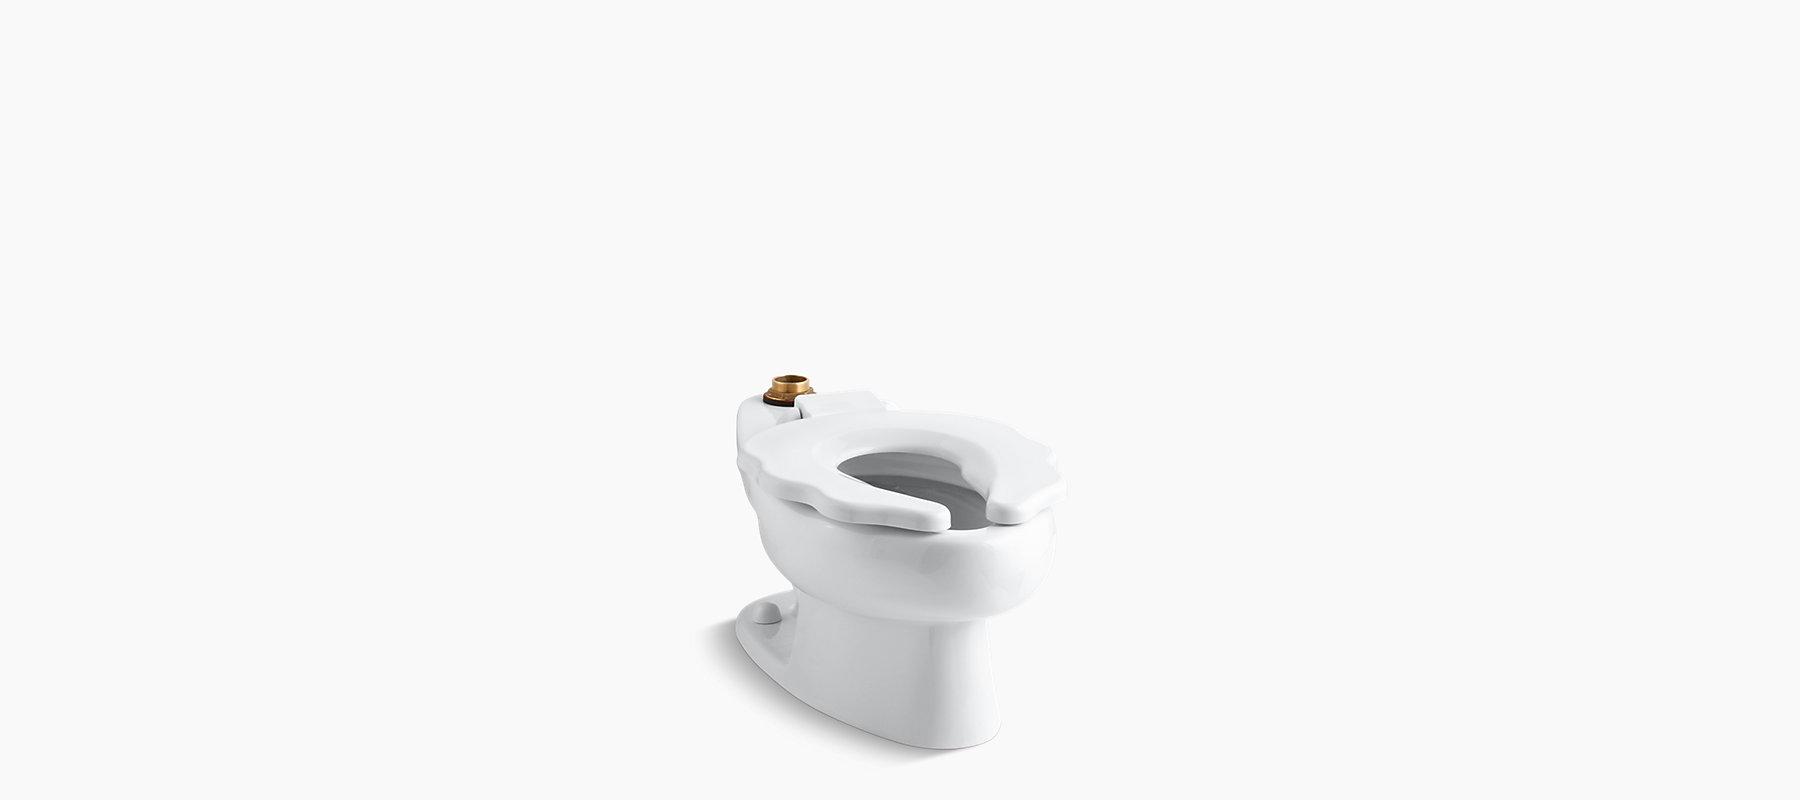 Primary 1.28 gpf elongated bowl with seat | K-4384 | KOHLER